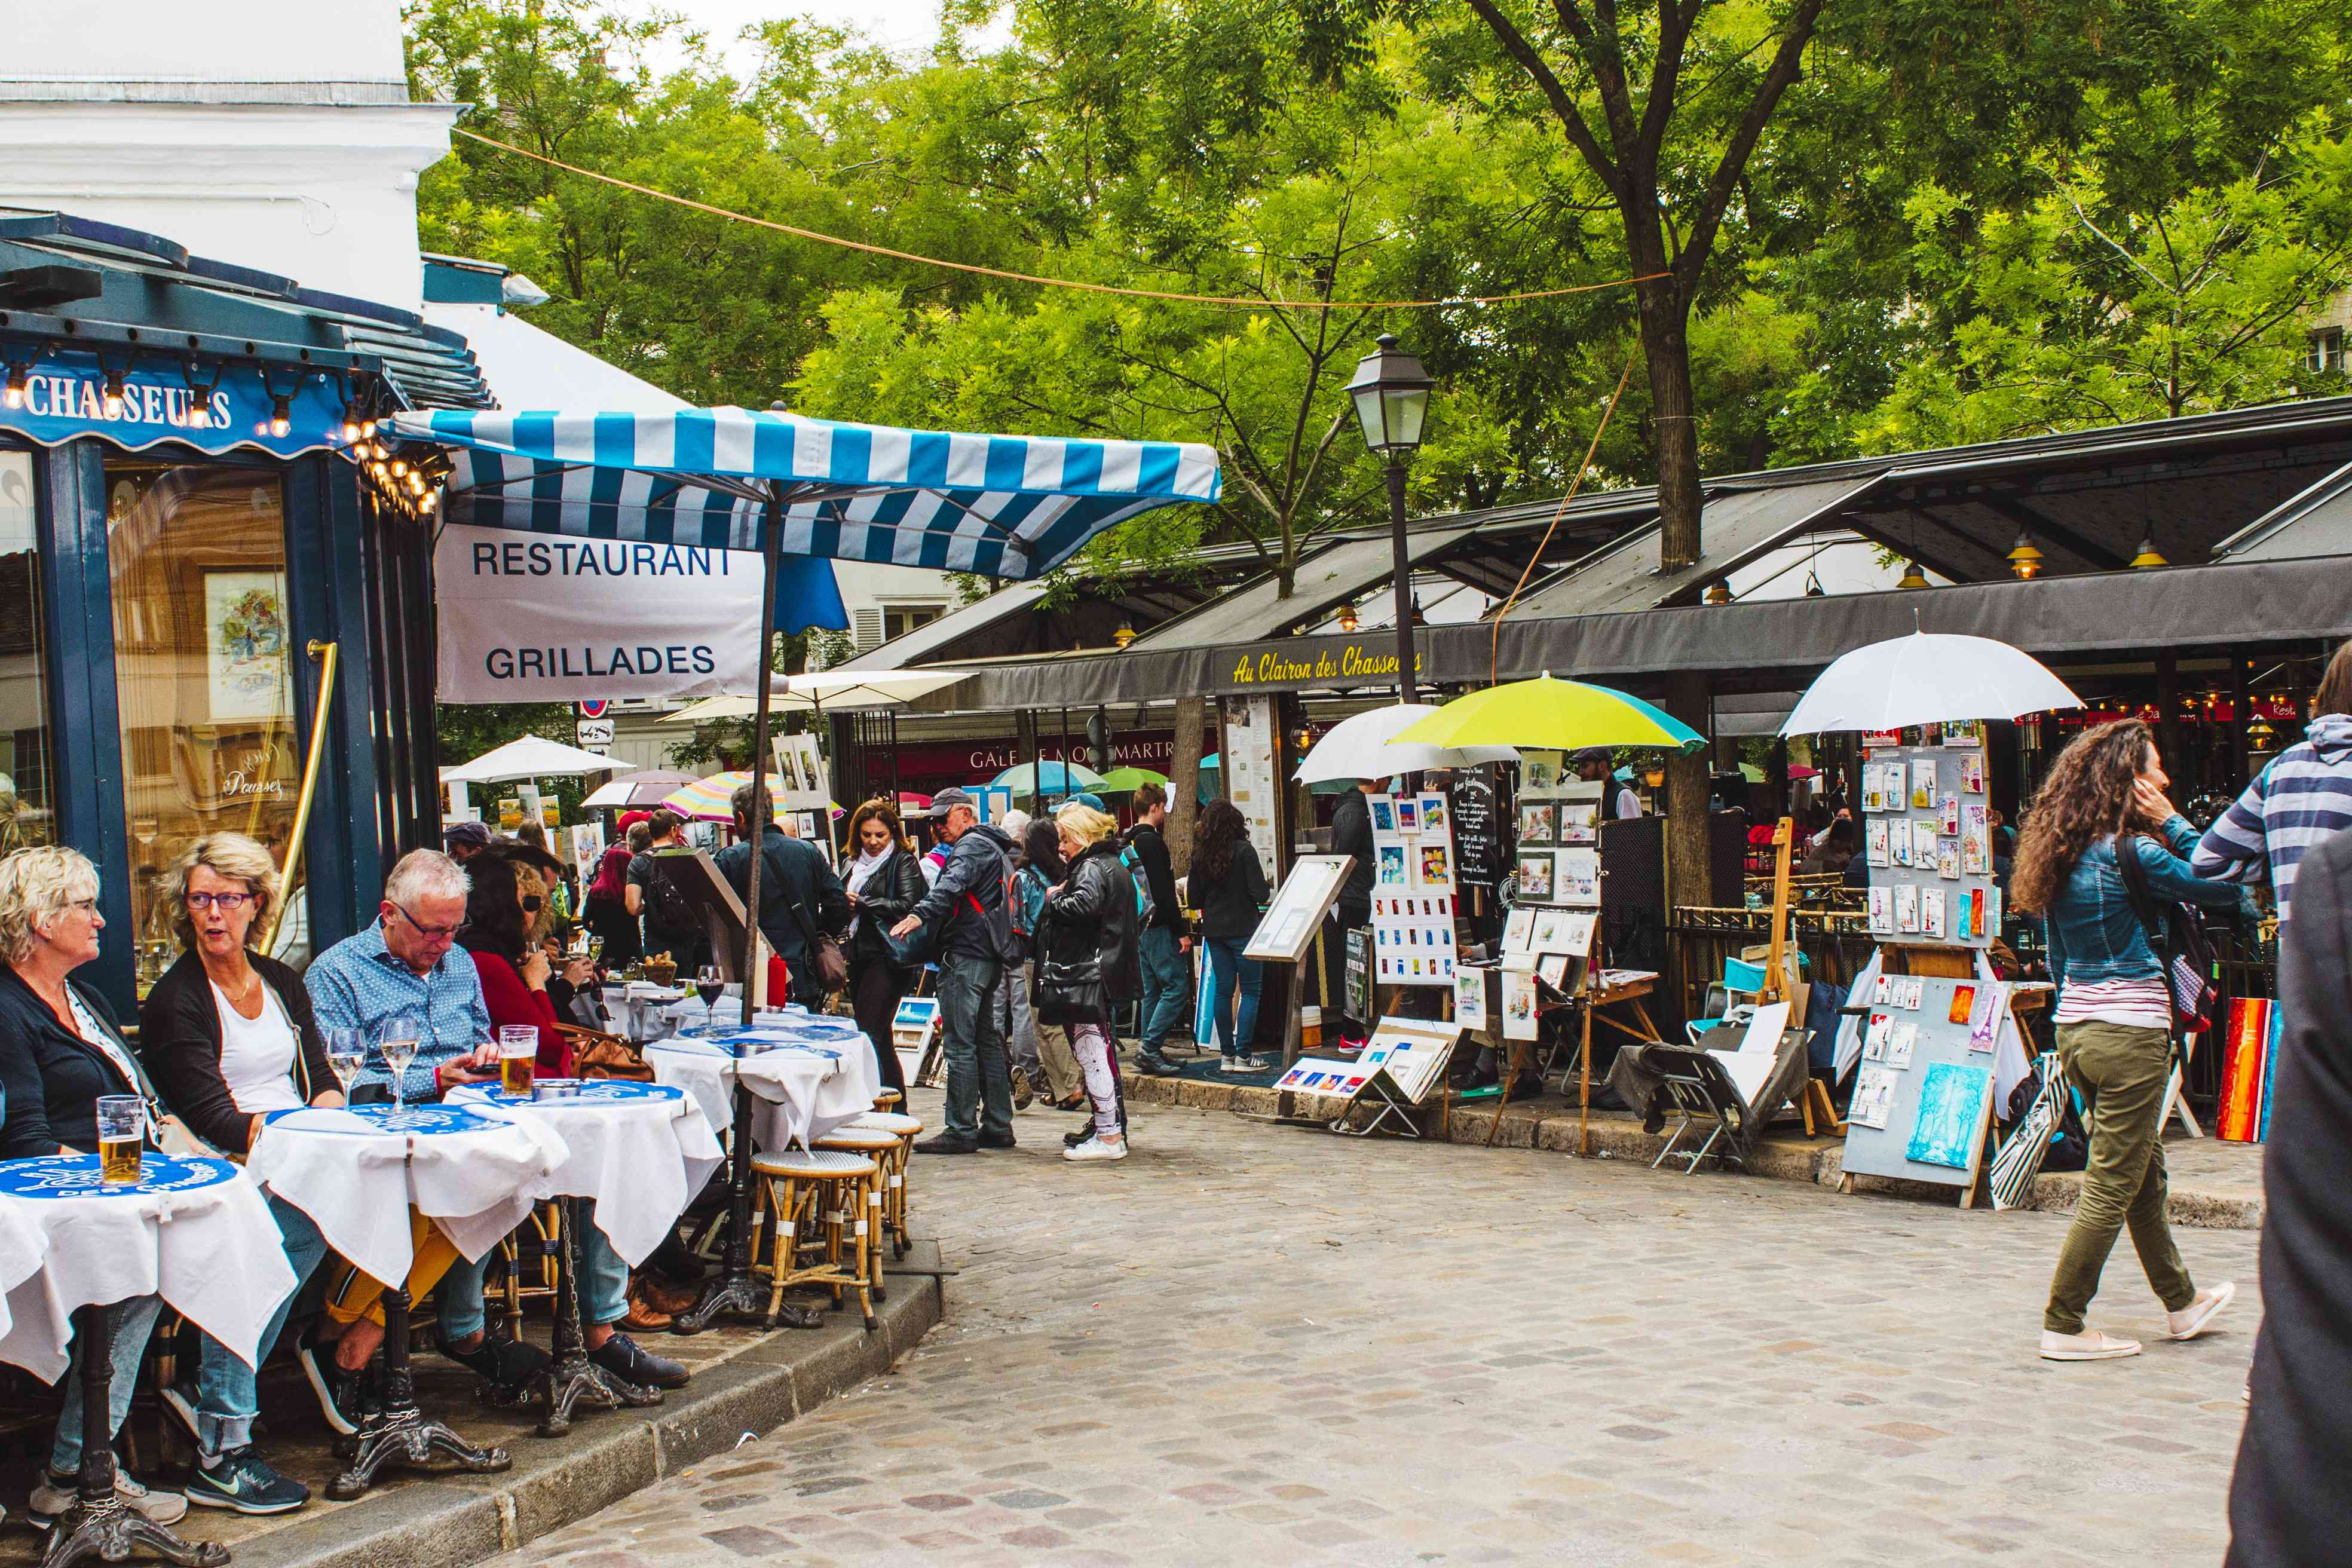 Square in Montmartre